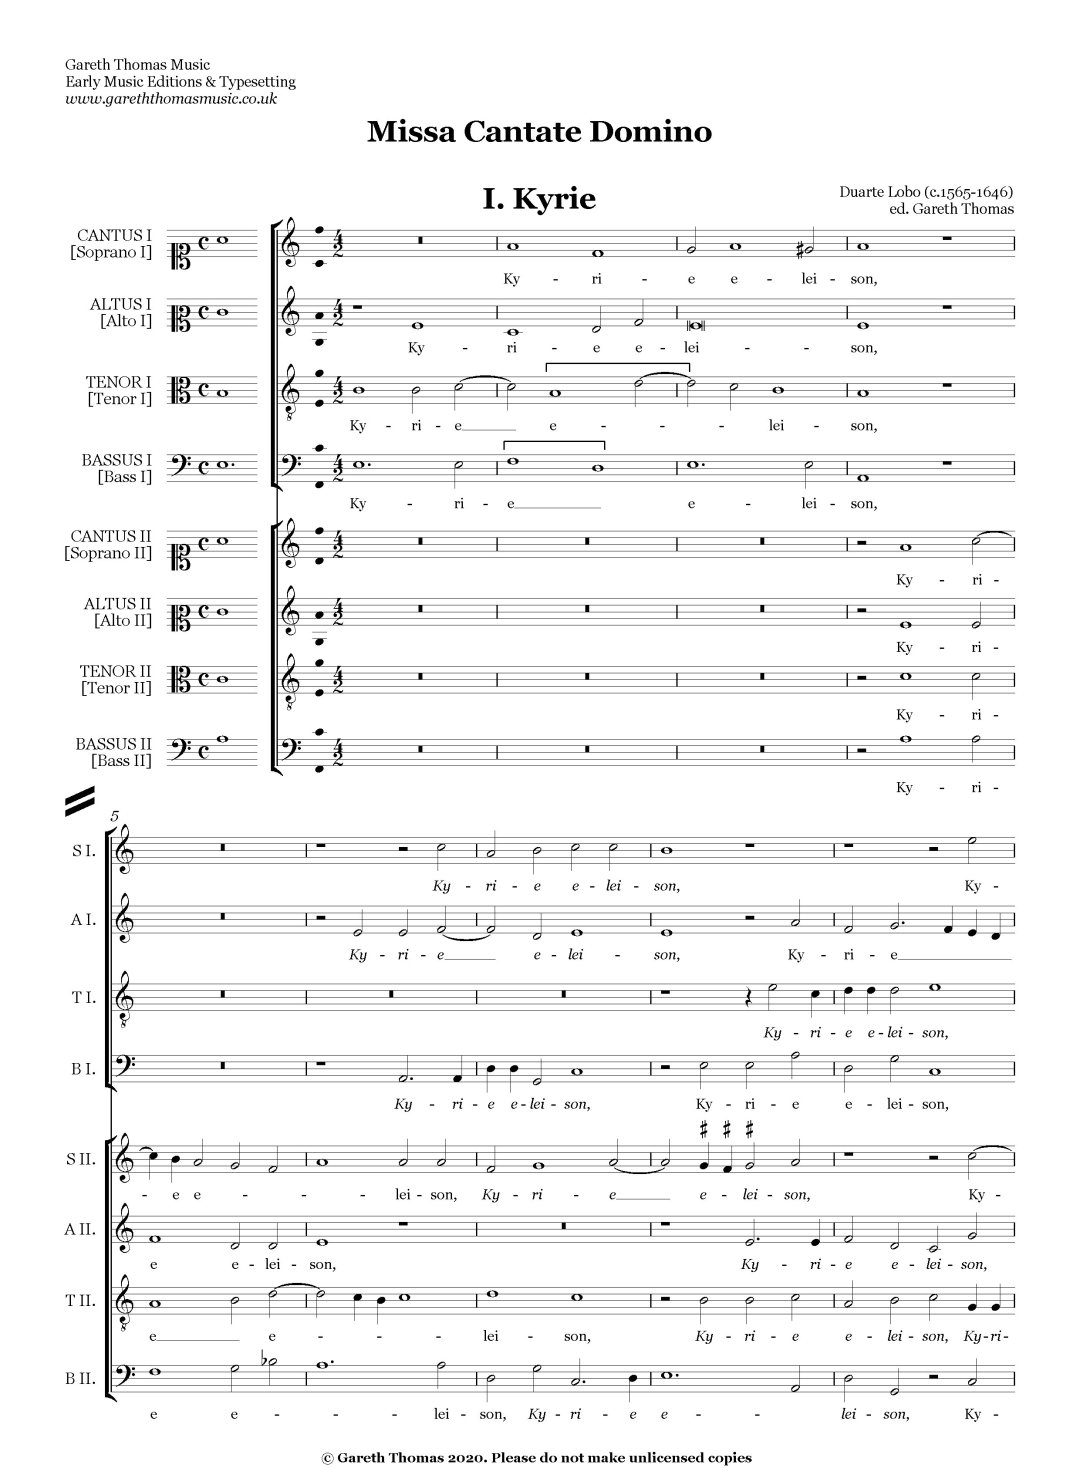 Duarte Lobo Missa Cantate Domino image